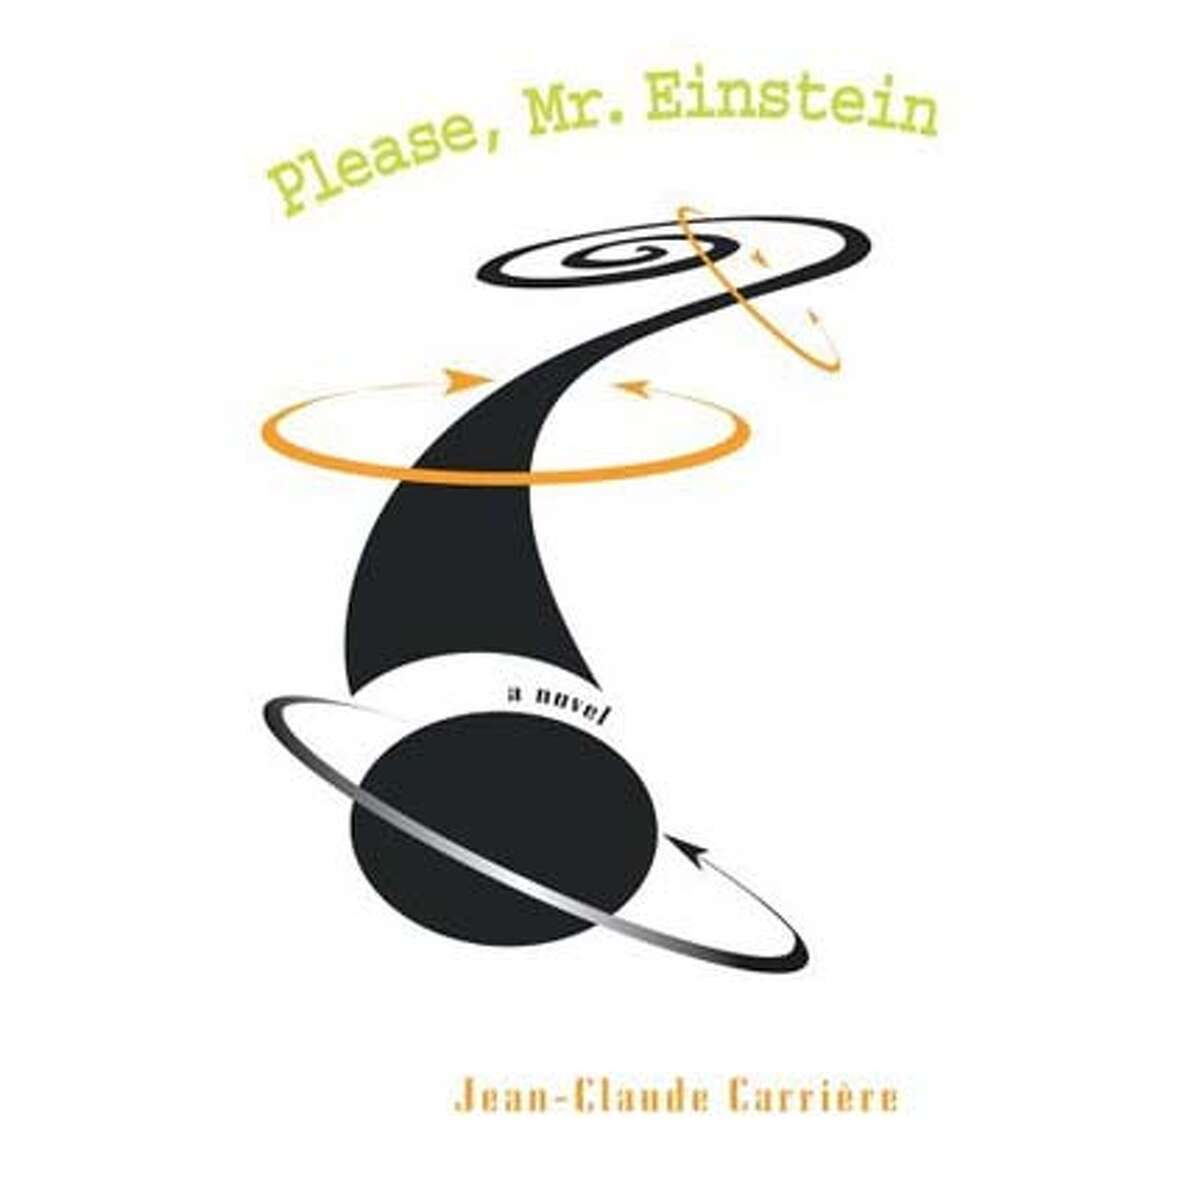 """Please, Mr. Einstein"" by Jean-Claude Carri�re, translated by John Brownjohn"